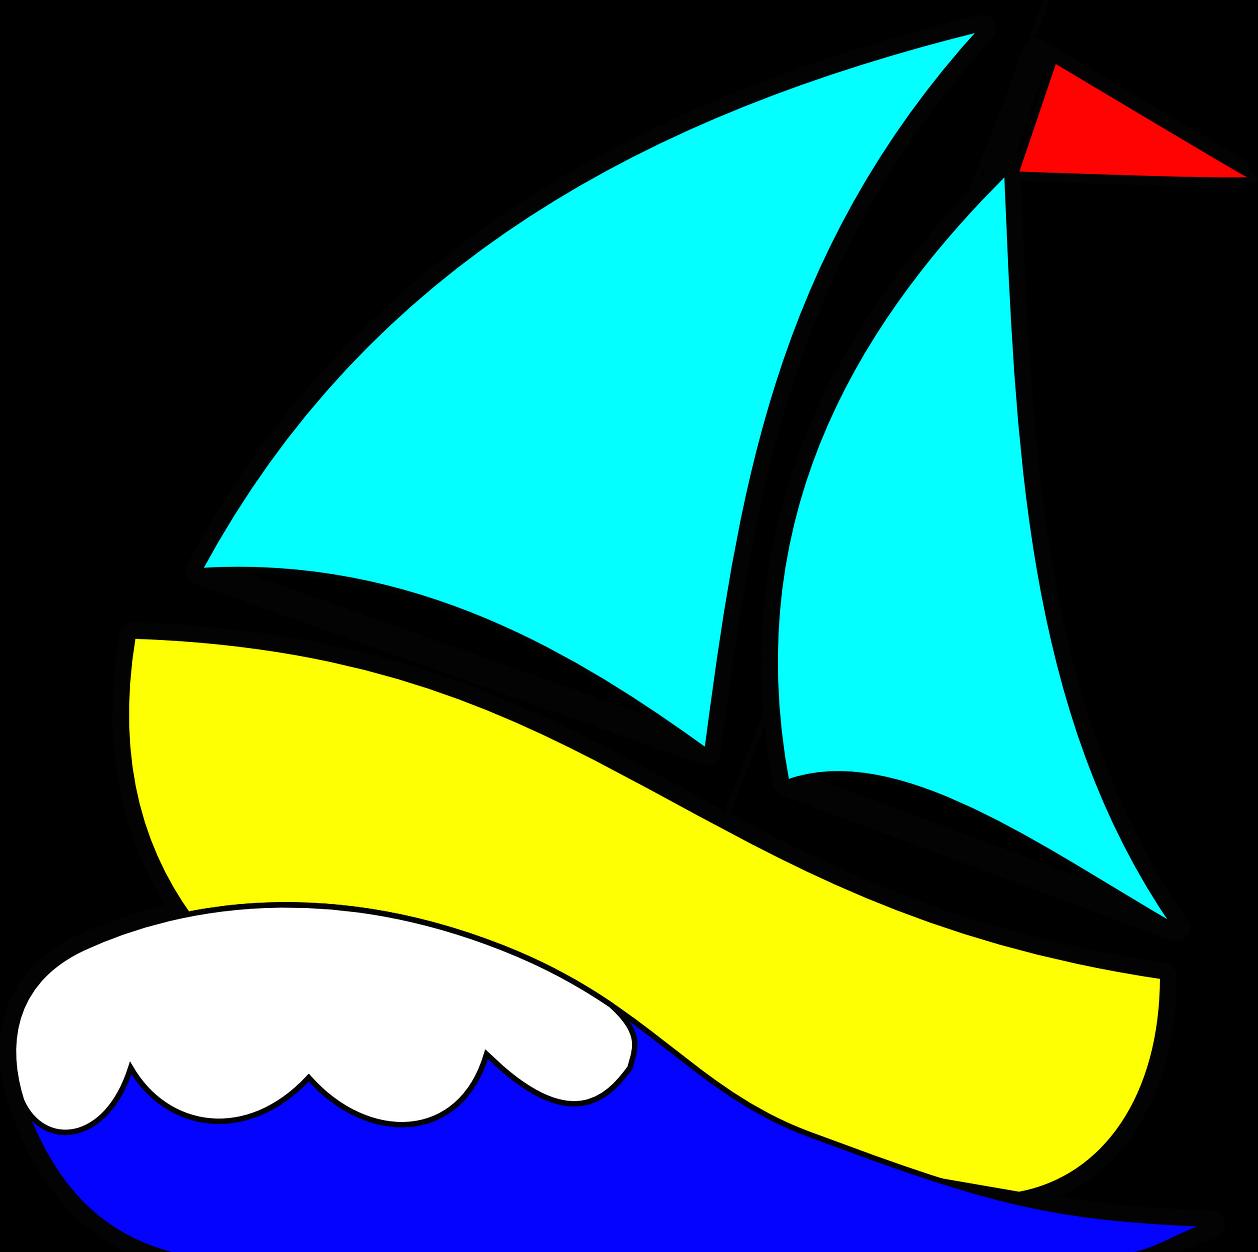 School of Sailing